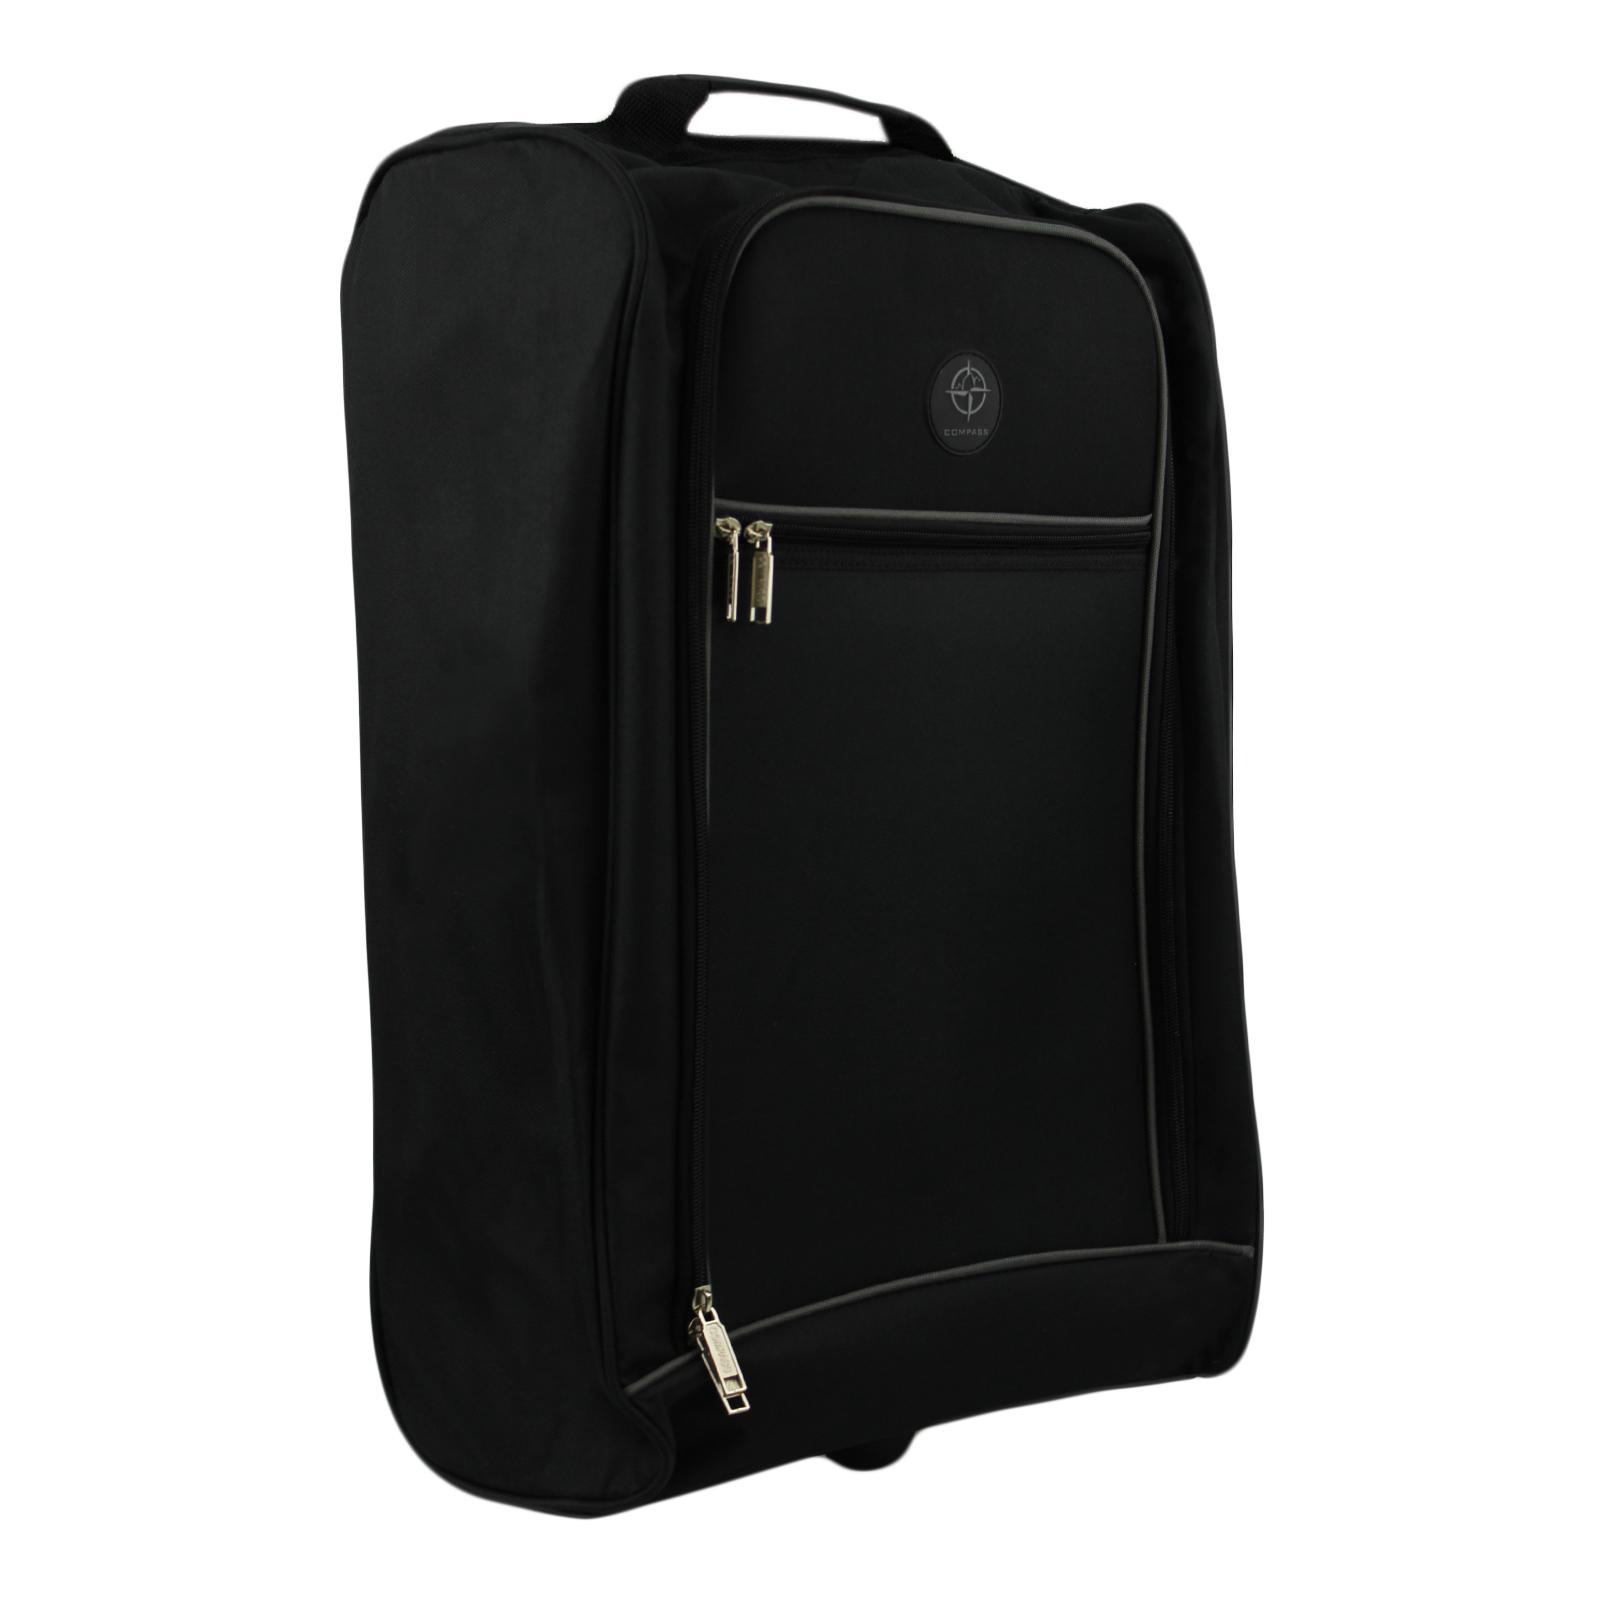 Urban Trading Online - Luggage Travel Bag Super Lightweight Cabin